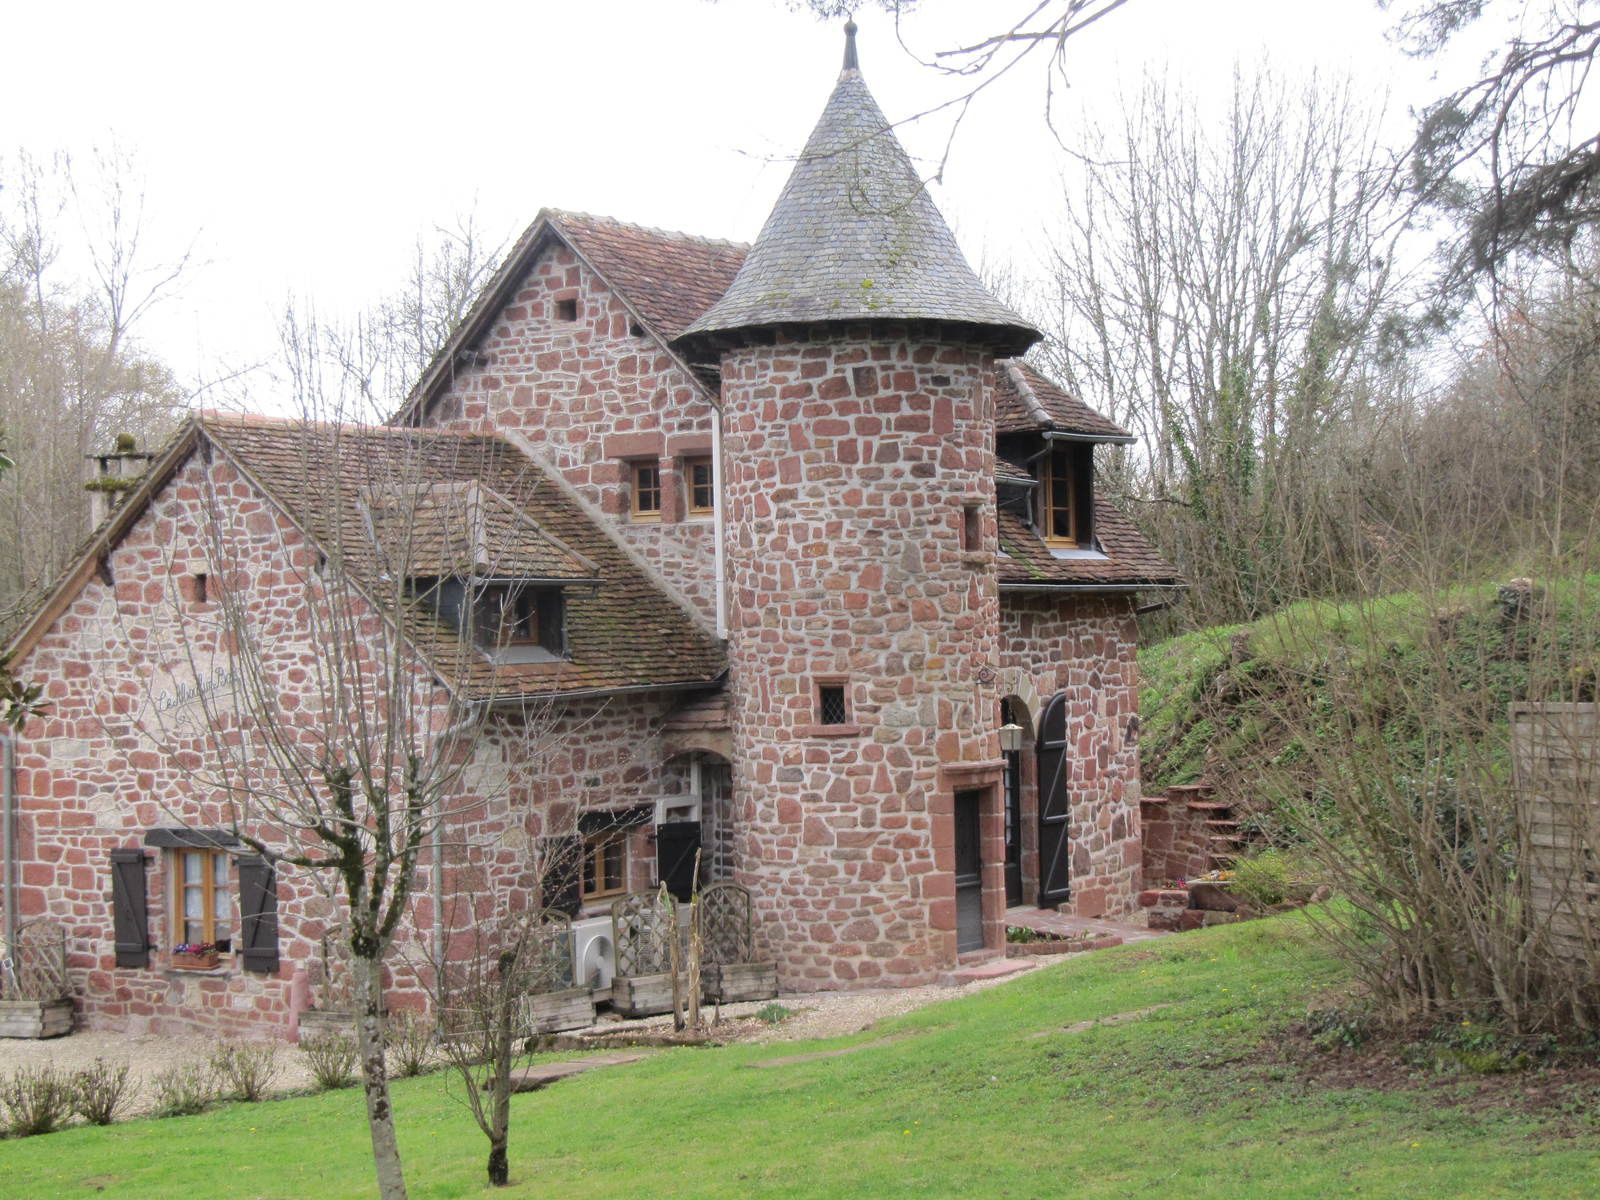 La maison de Cendrillon?